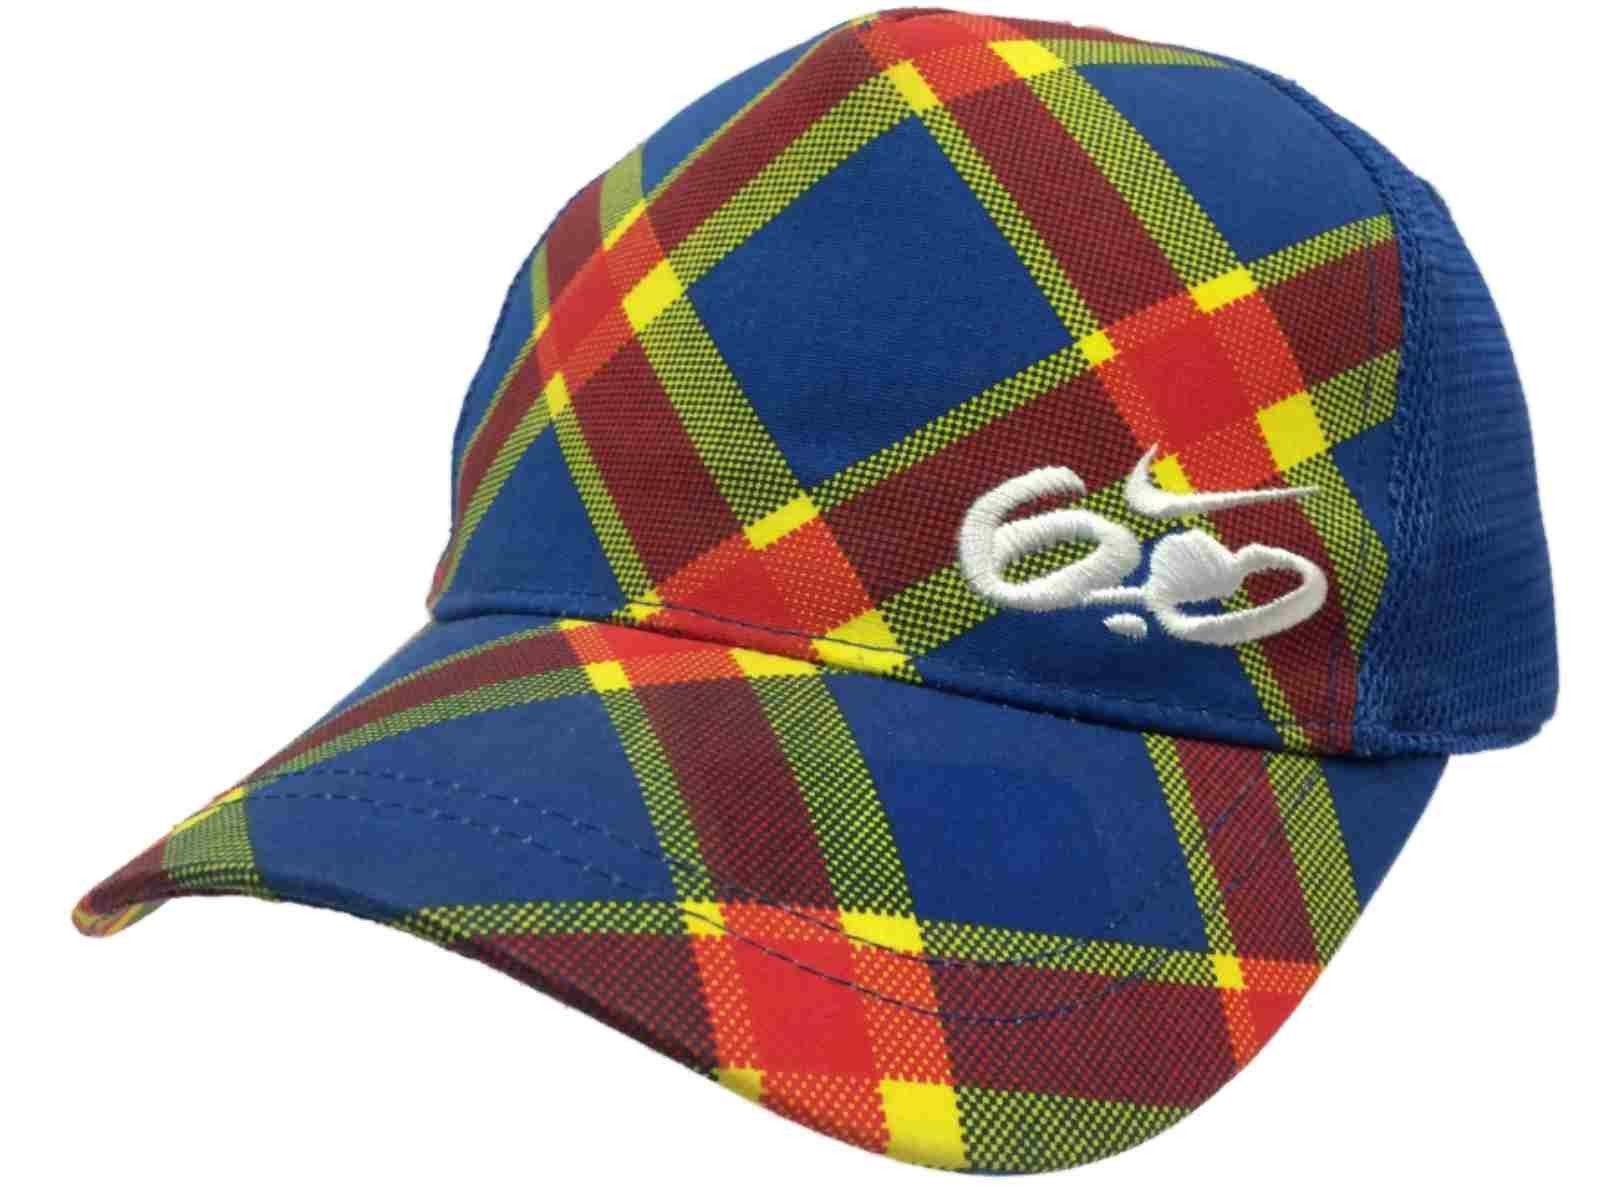 e1e518d3b0d ... czech nike 6.0 youth red yellow blue plaid mesh adjustable hat cap 8 20  60fea 67fdd